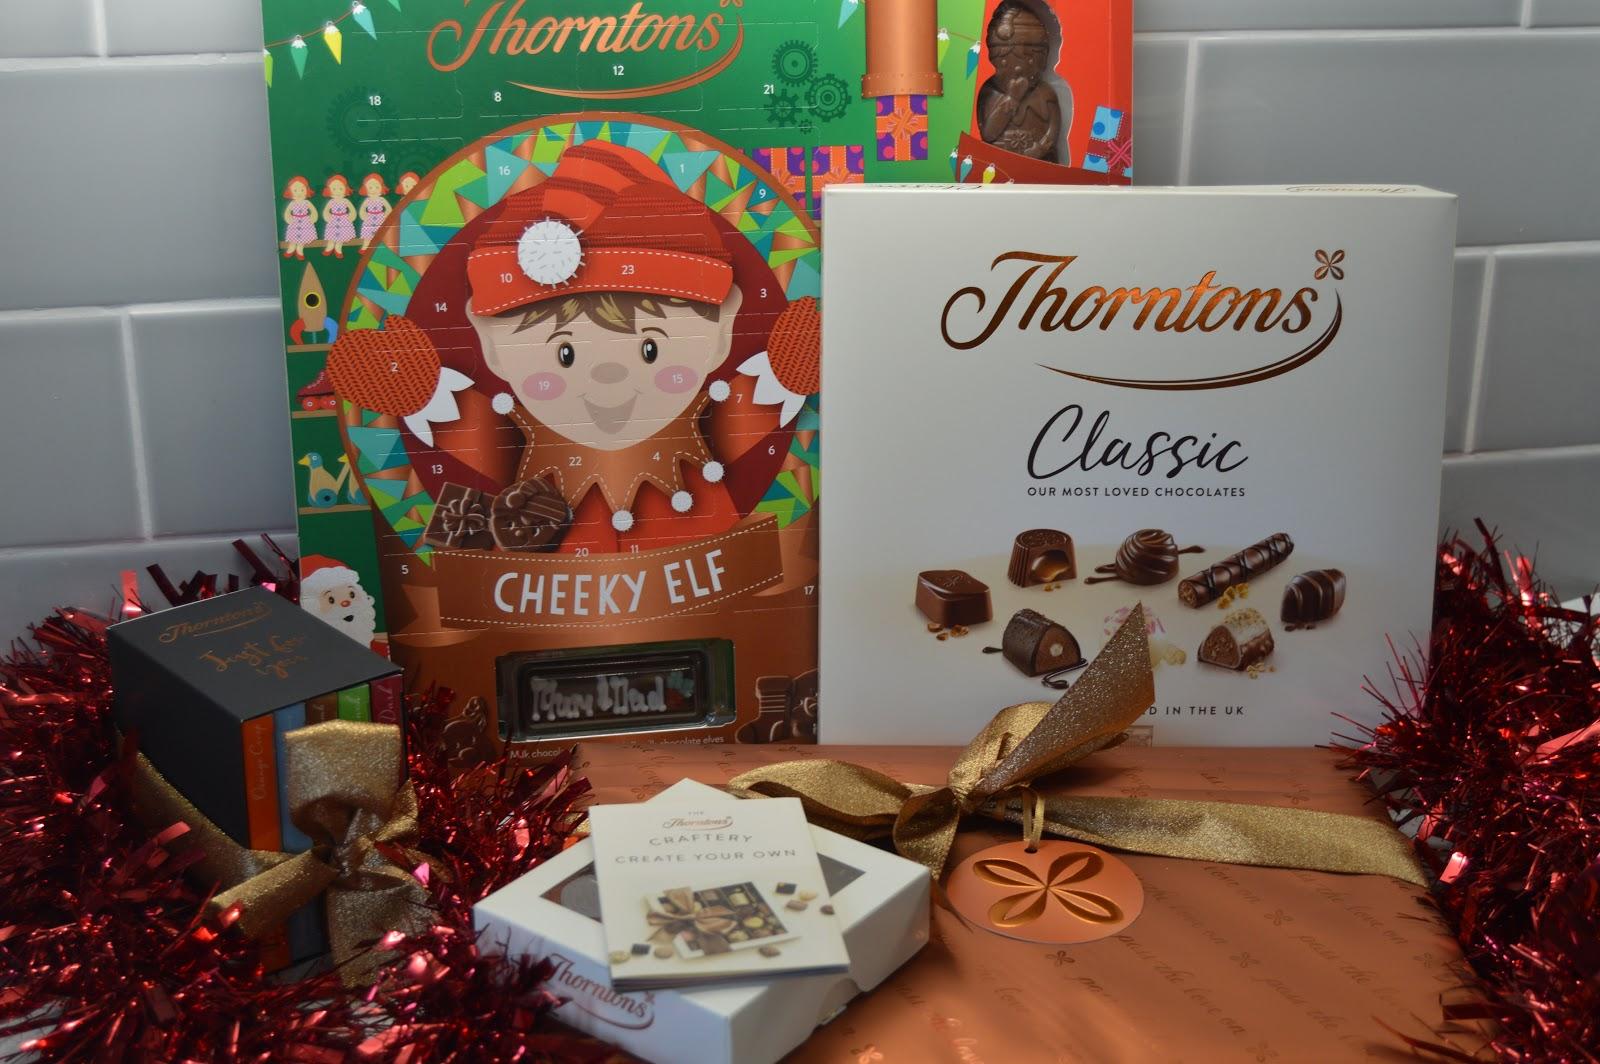 Thorntons chocolate range